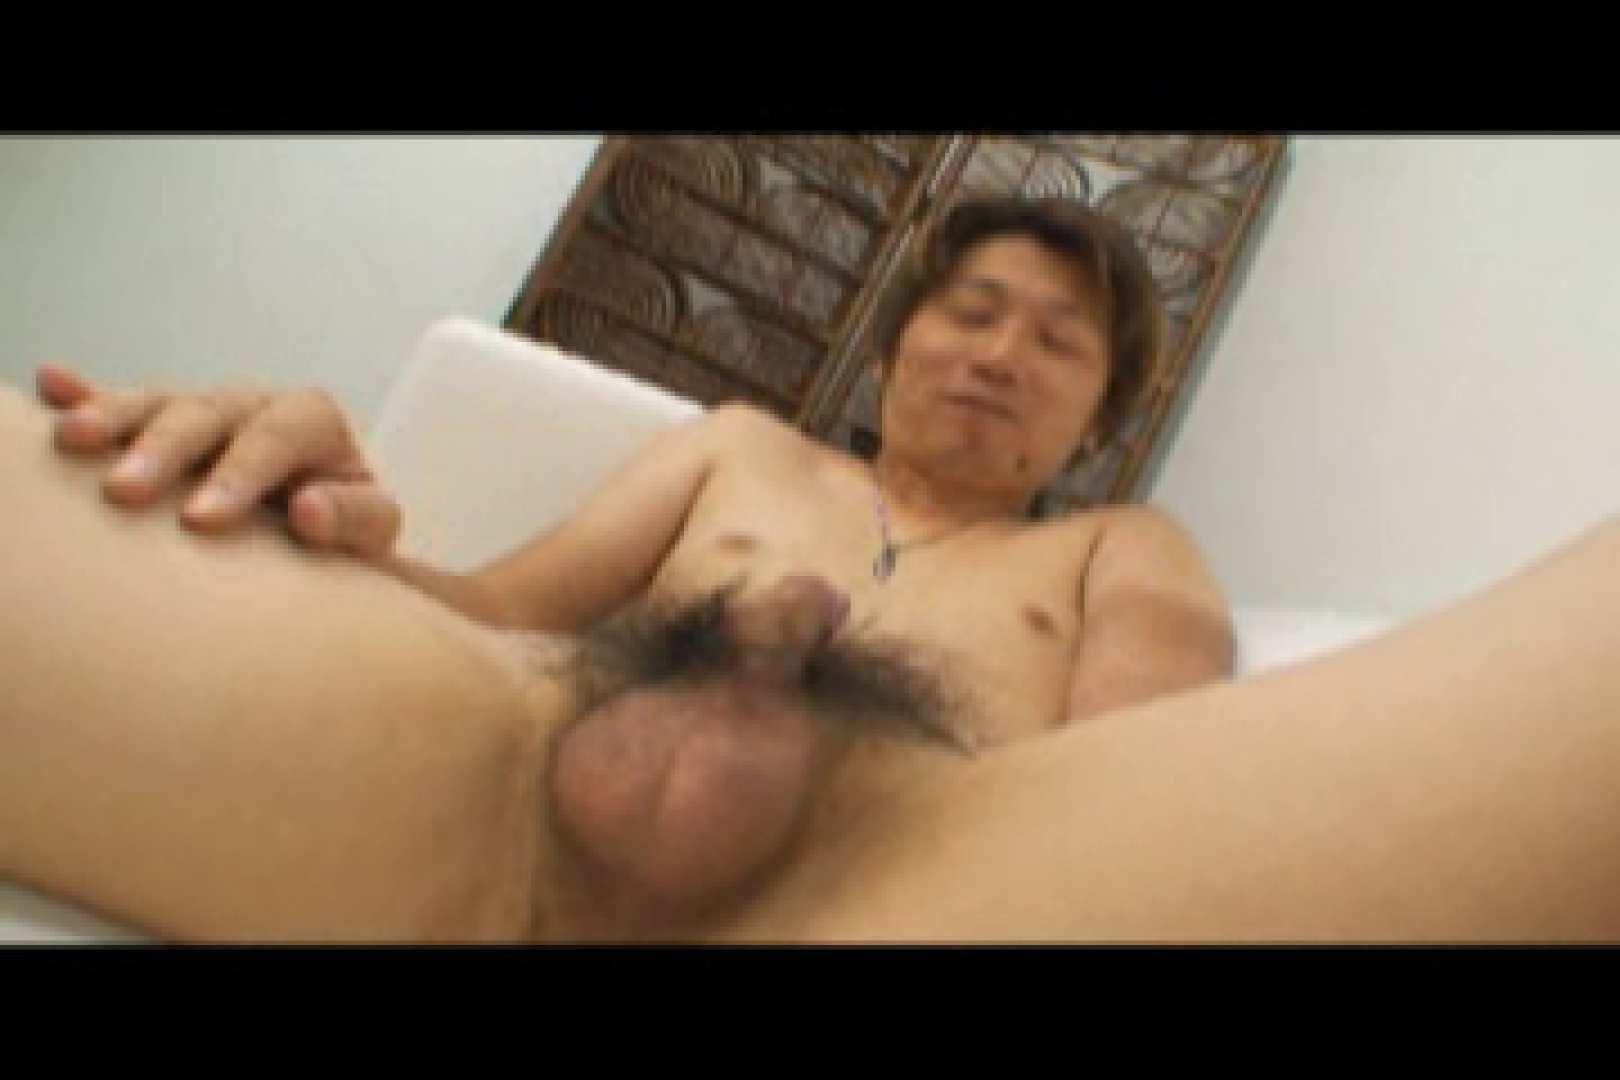 Do you like masturbation ?vol.04 ゲイのオナニー映像 | ノンケ君達の・・  105枚 27